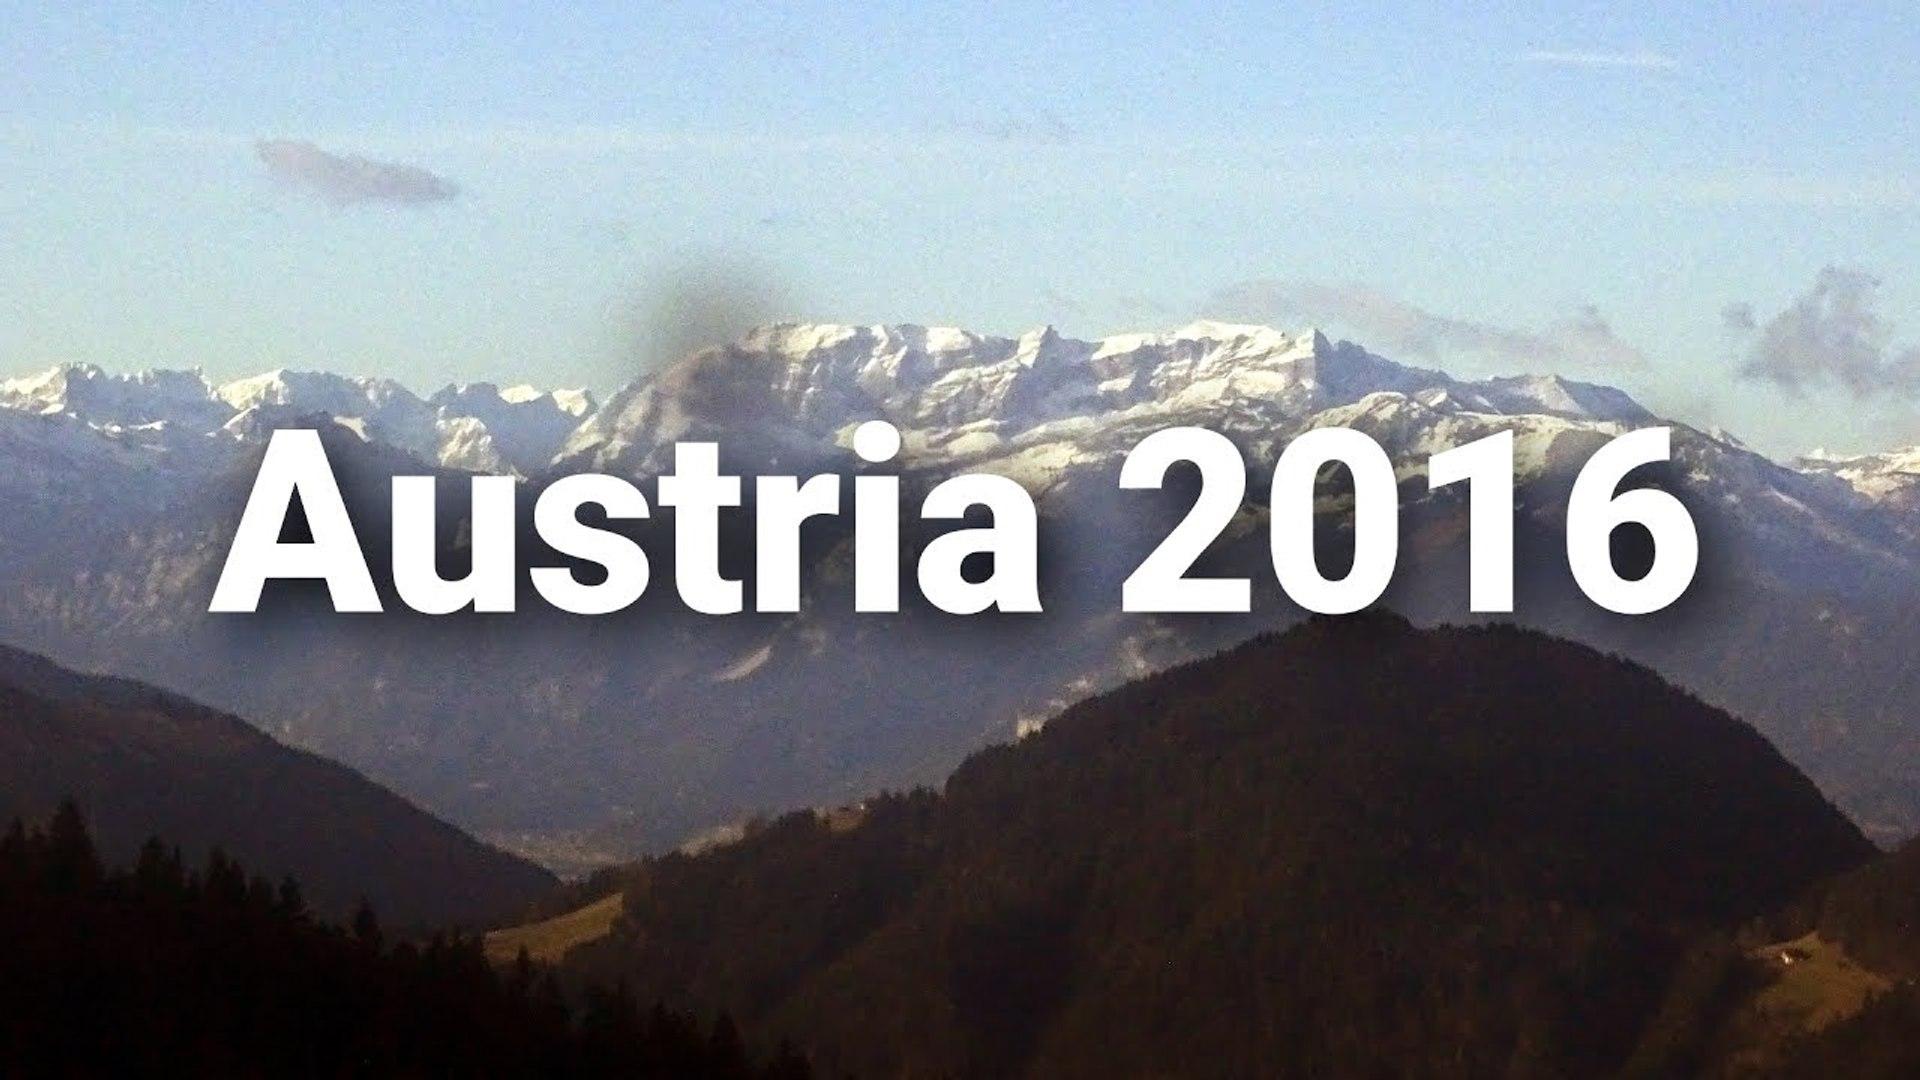 Austria 2016 - by Junity